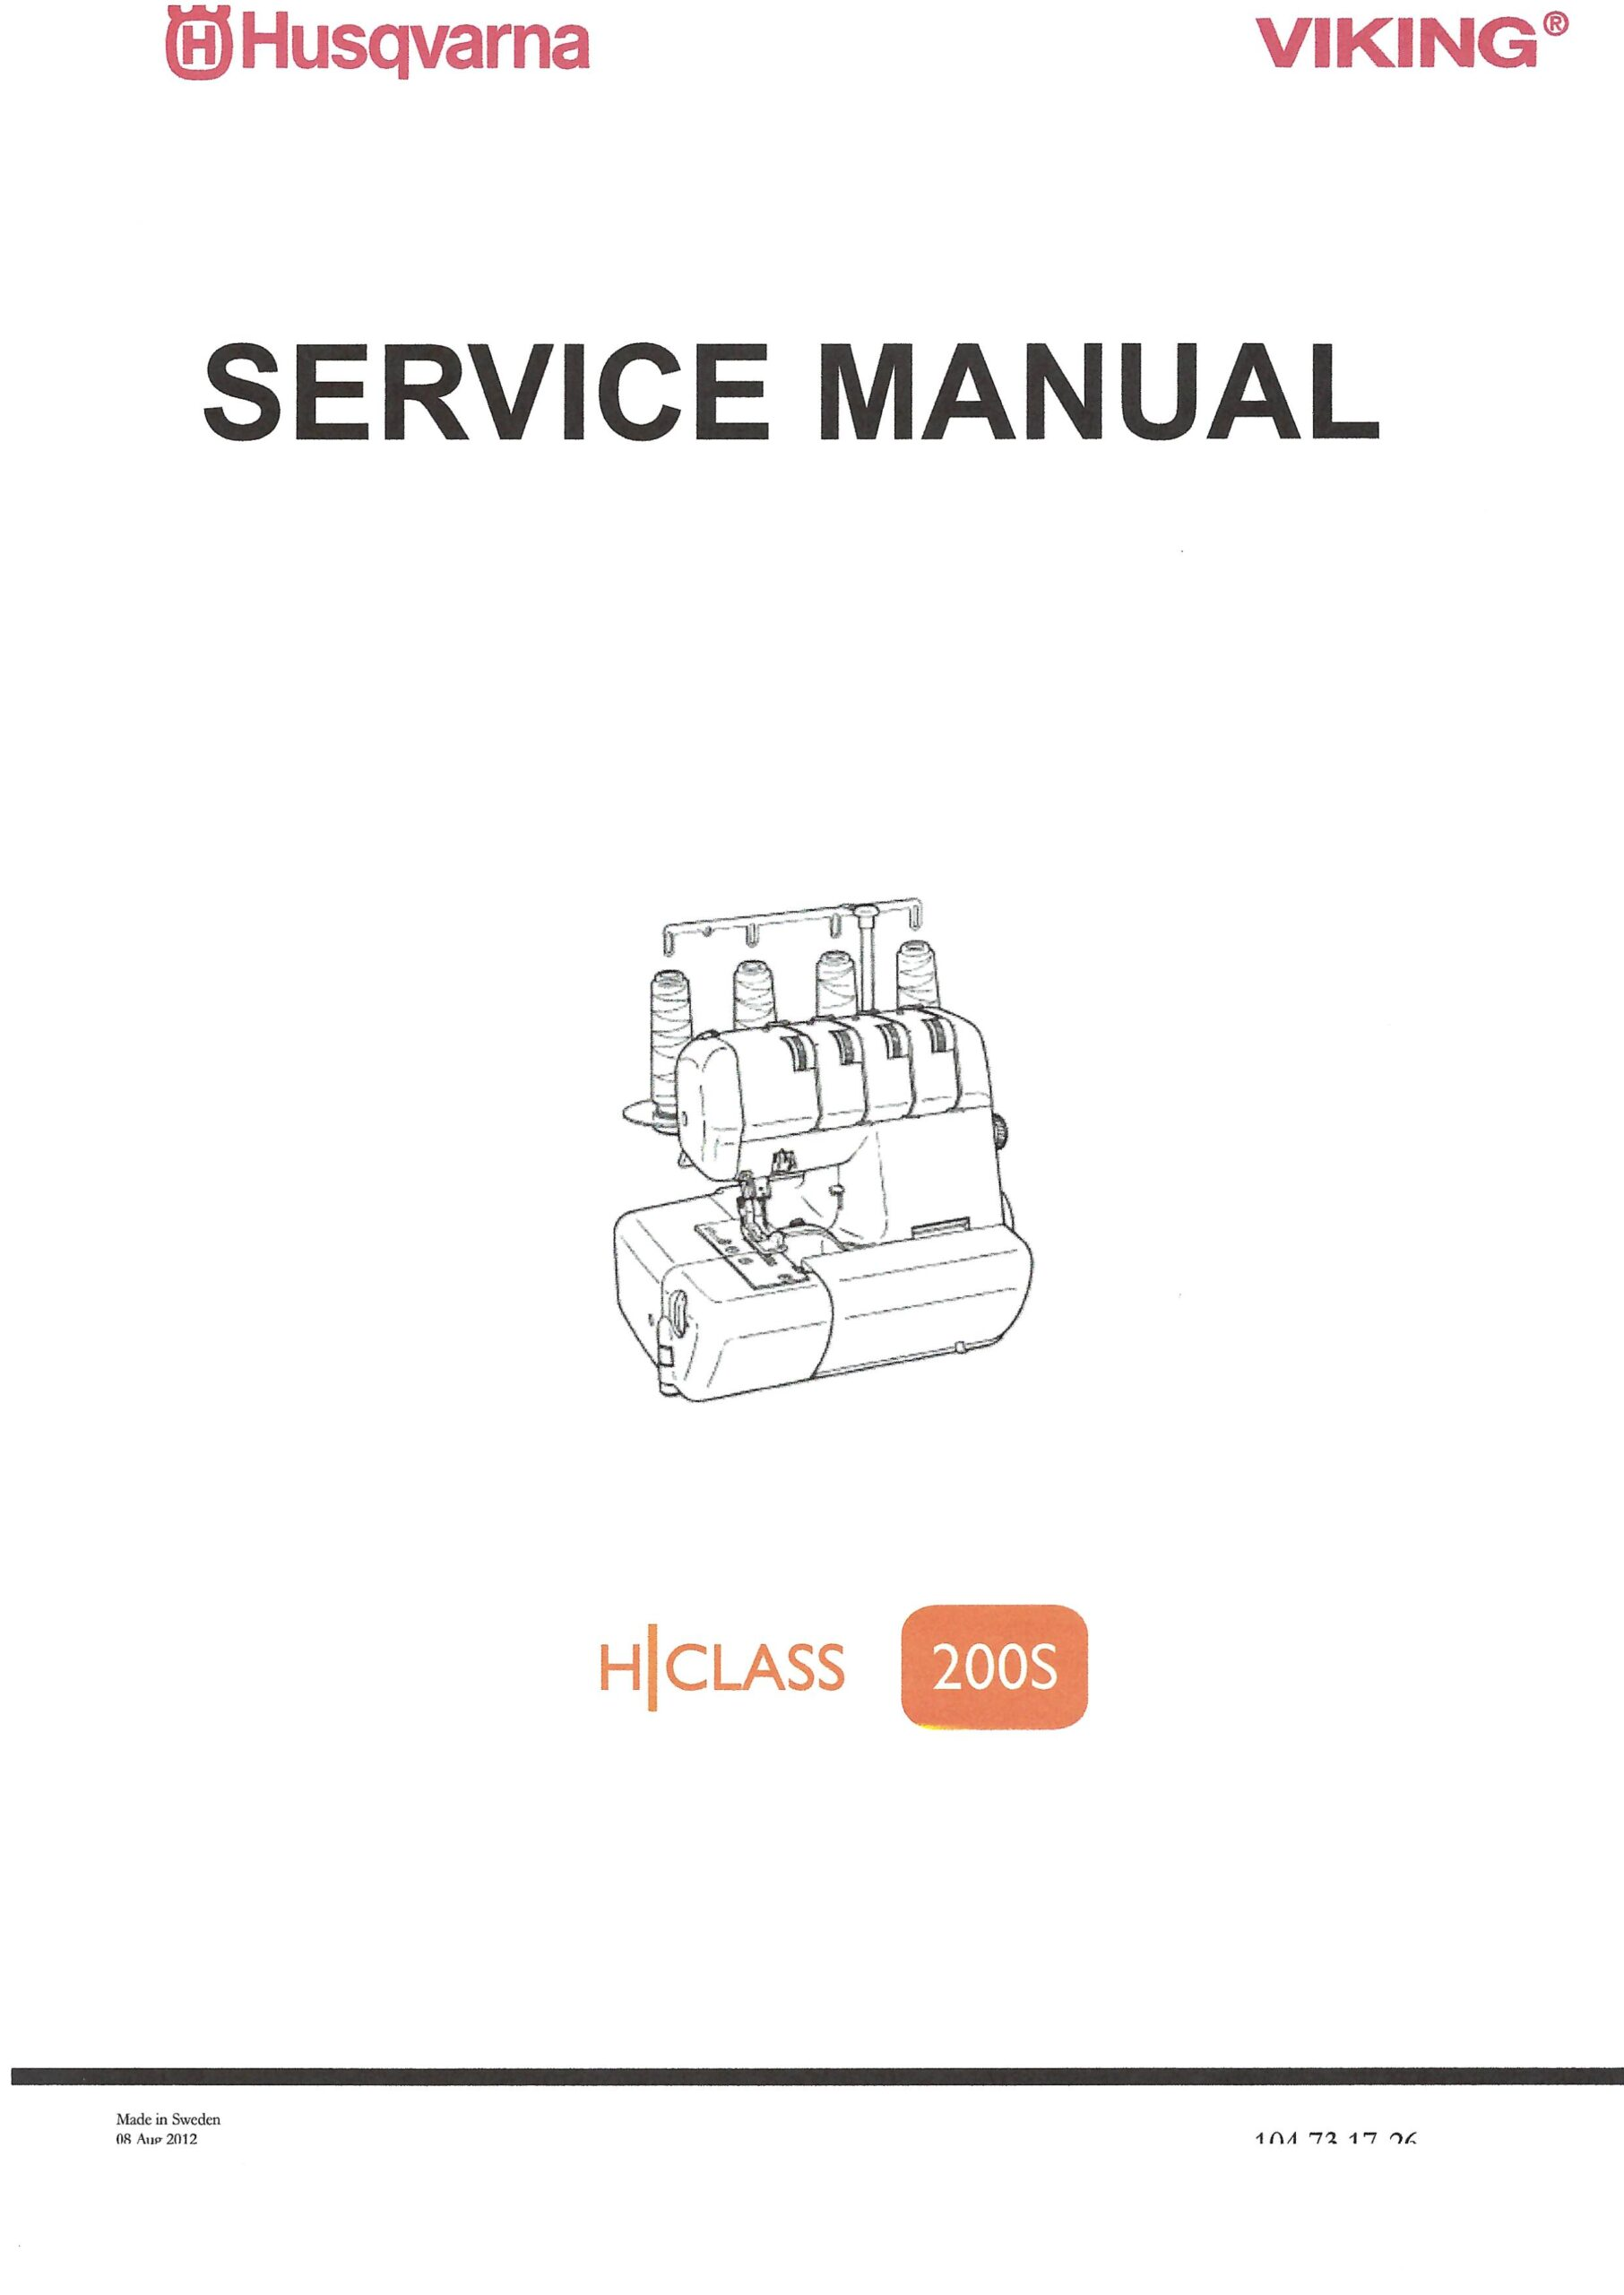 Service Manual Viking H-Class 200S Serger Machine